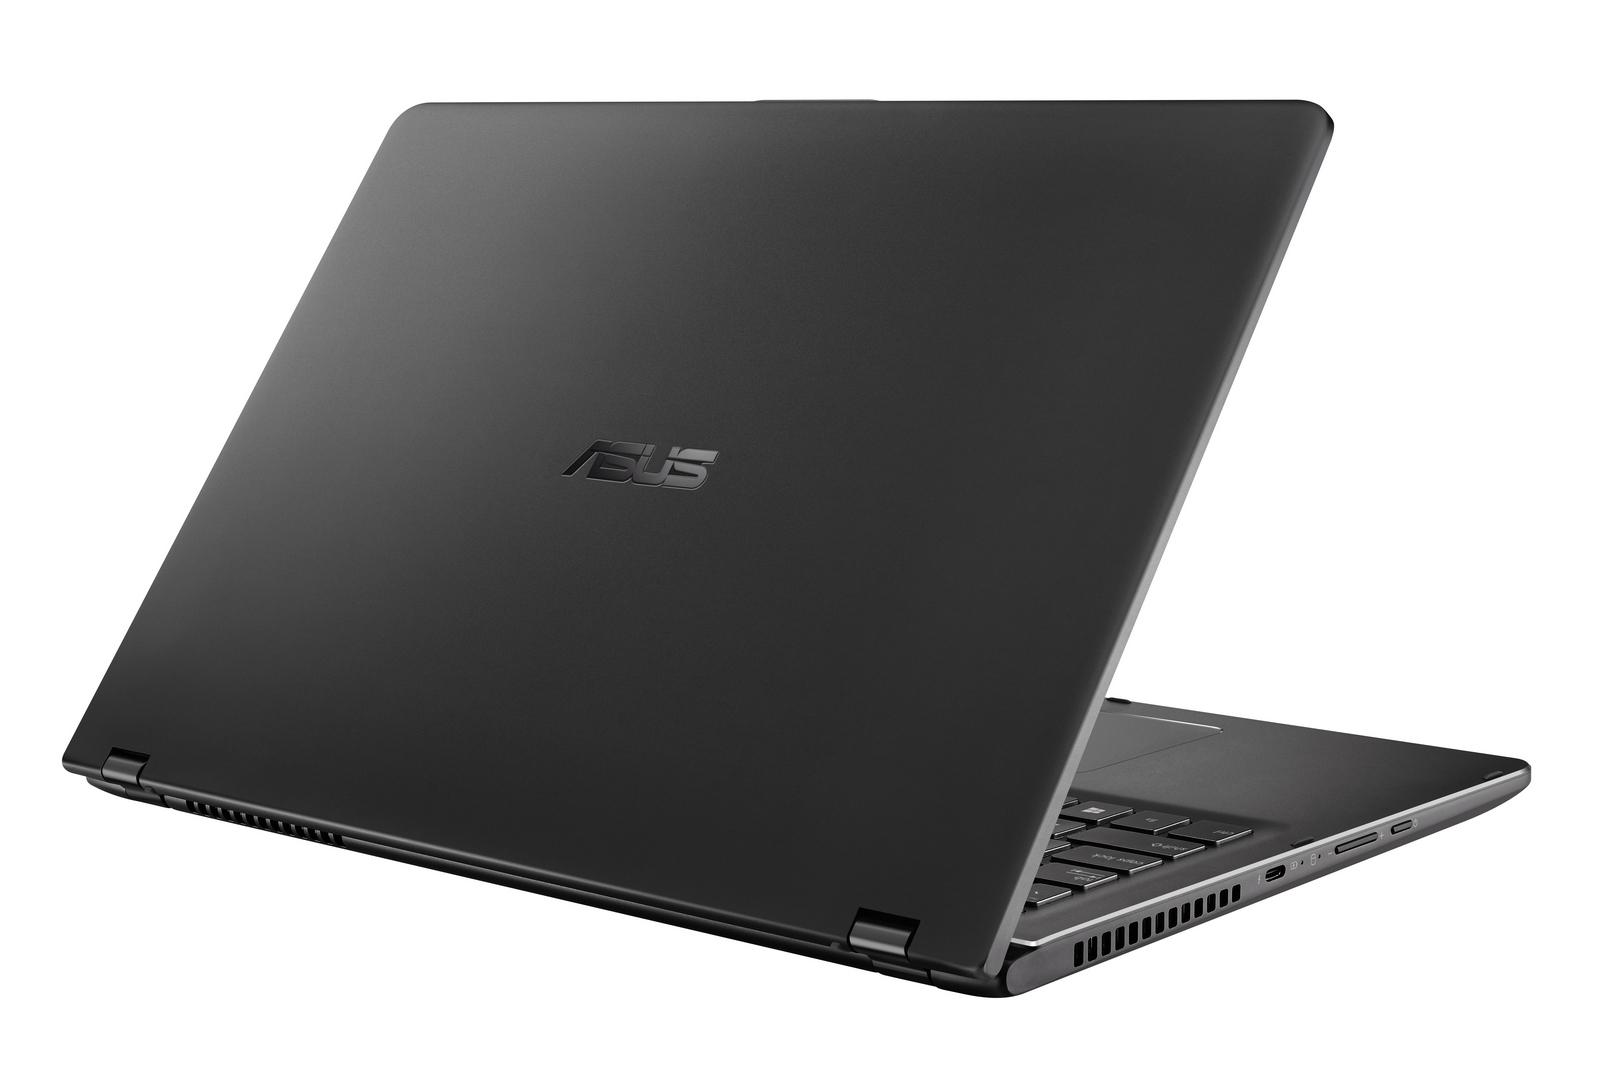 ایفا 2017: ایسوس لپتاپهای ASUS ZenBook Flip 14 و 15 ASUS ZenBook Flip را معرفی کرد